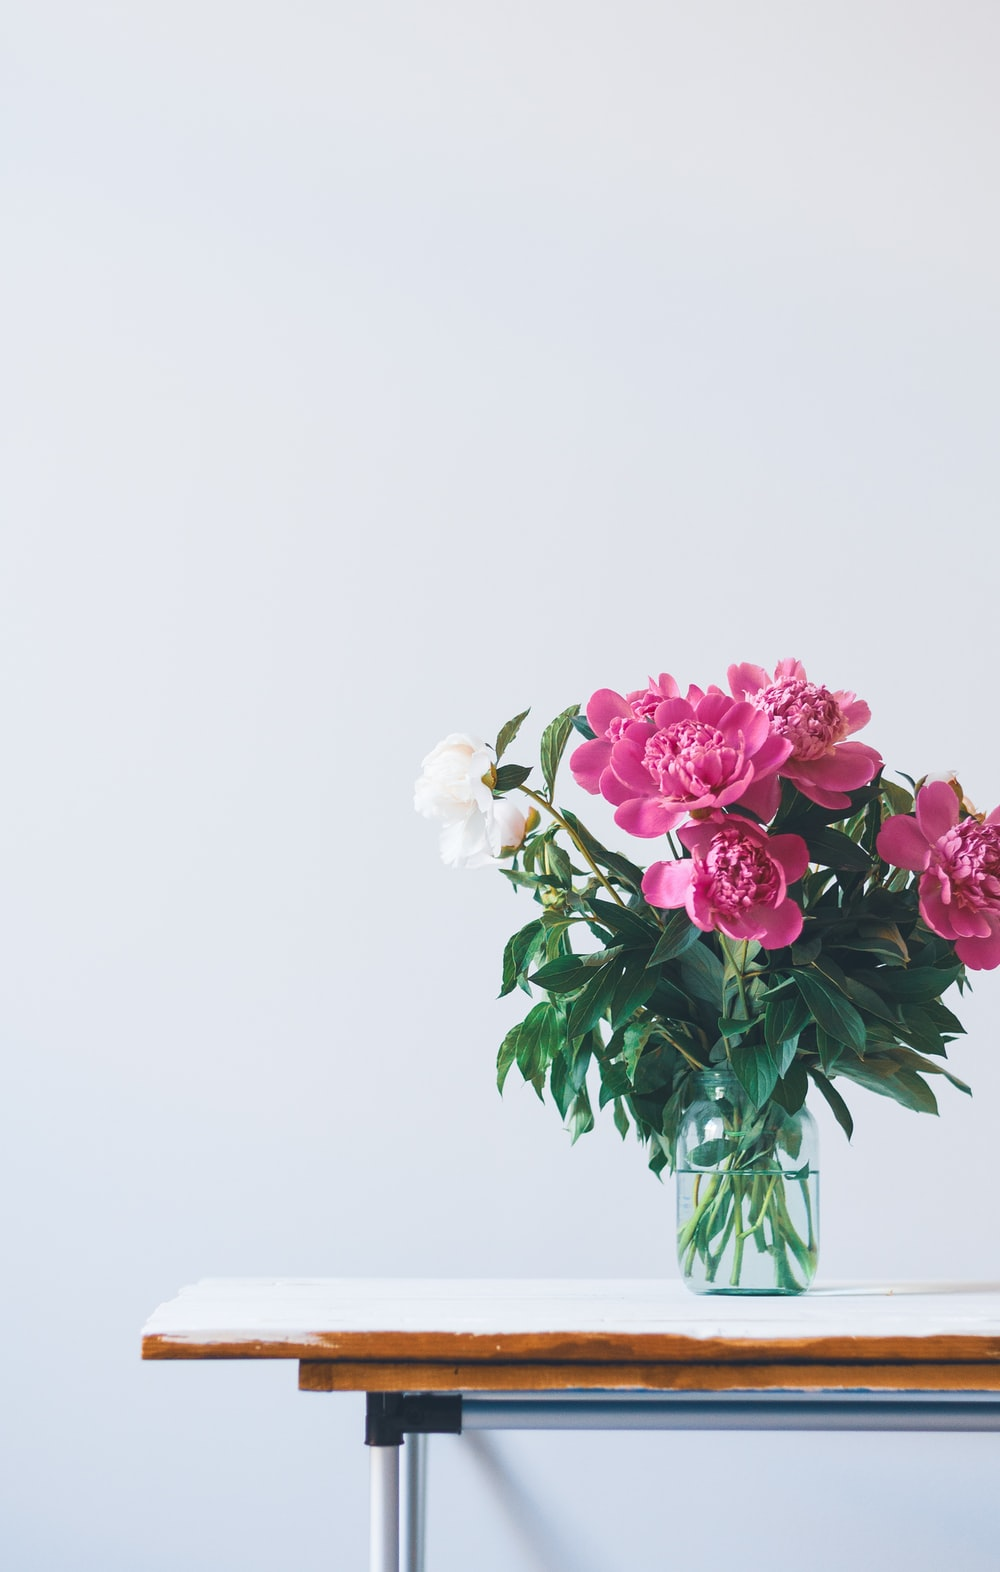 Minimal Floral Plant And Vase Hd Photo By Olia Gozha Olia On